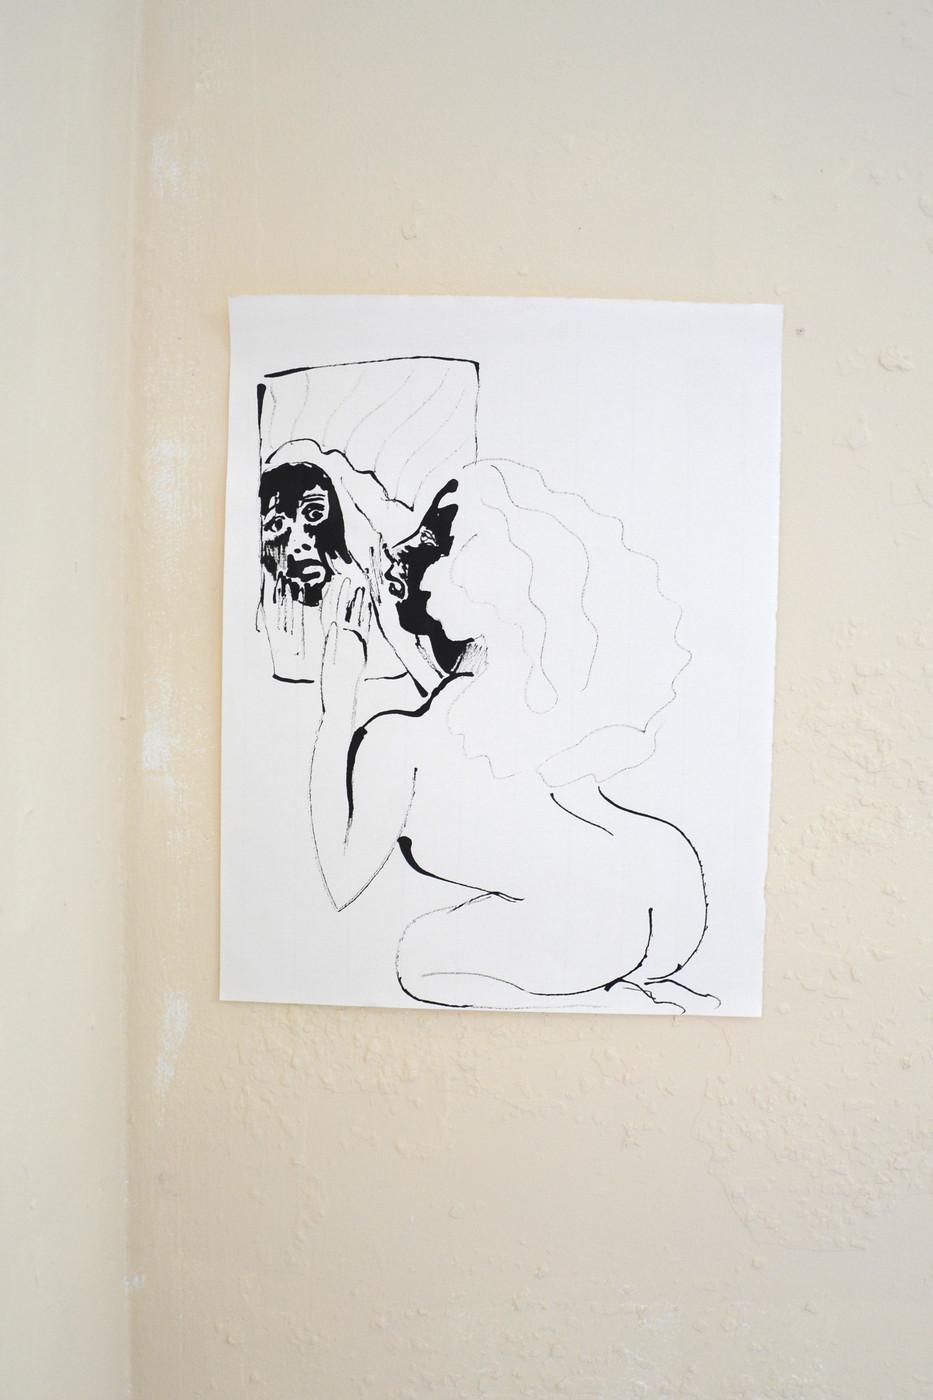 12 charlott weise, untitled, 2016